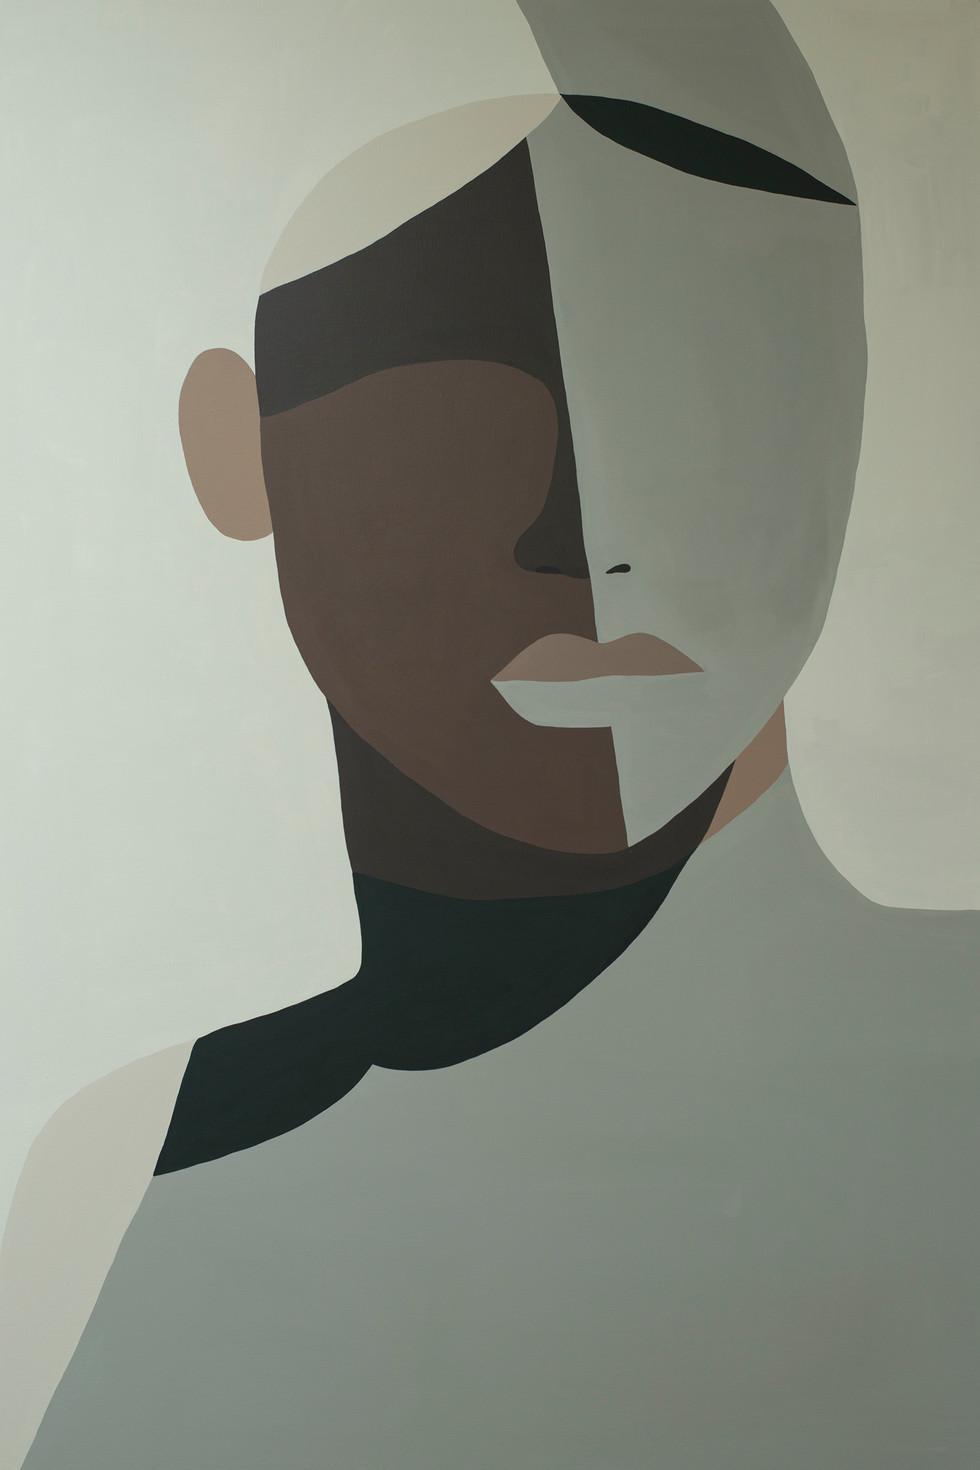 Witness, 2020 acrylic on canvas 80 x 120 cm